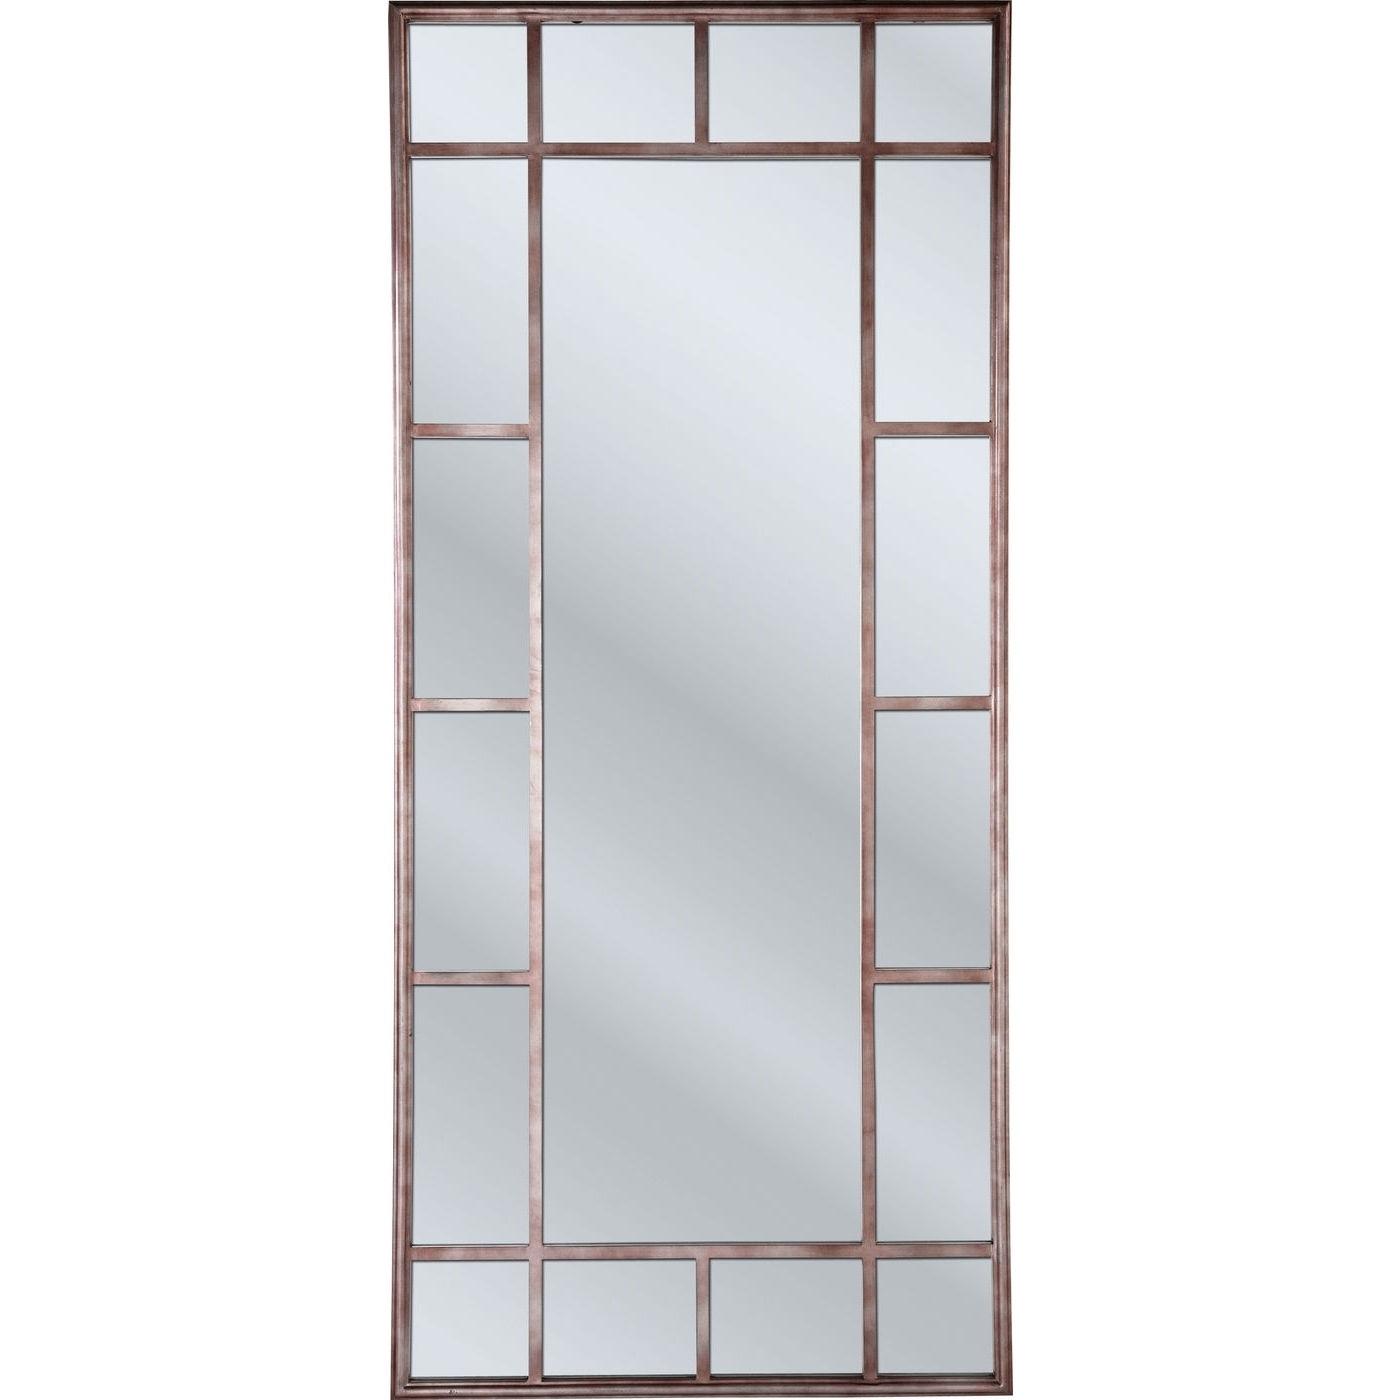 Spiegel Window Iron 200x90cm